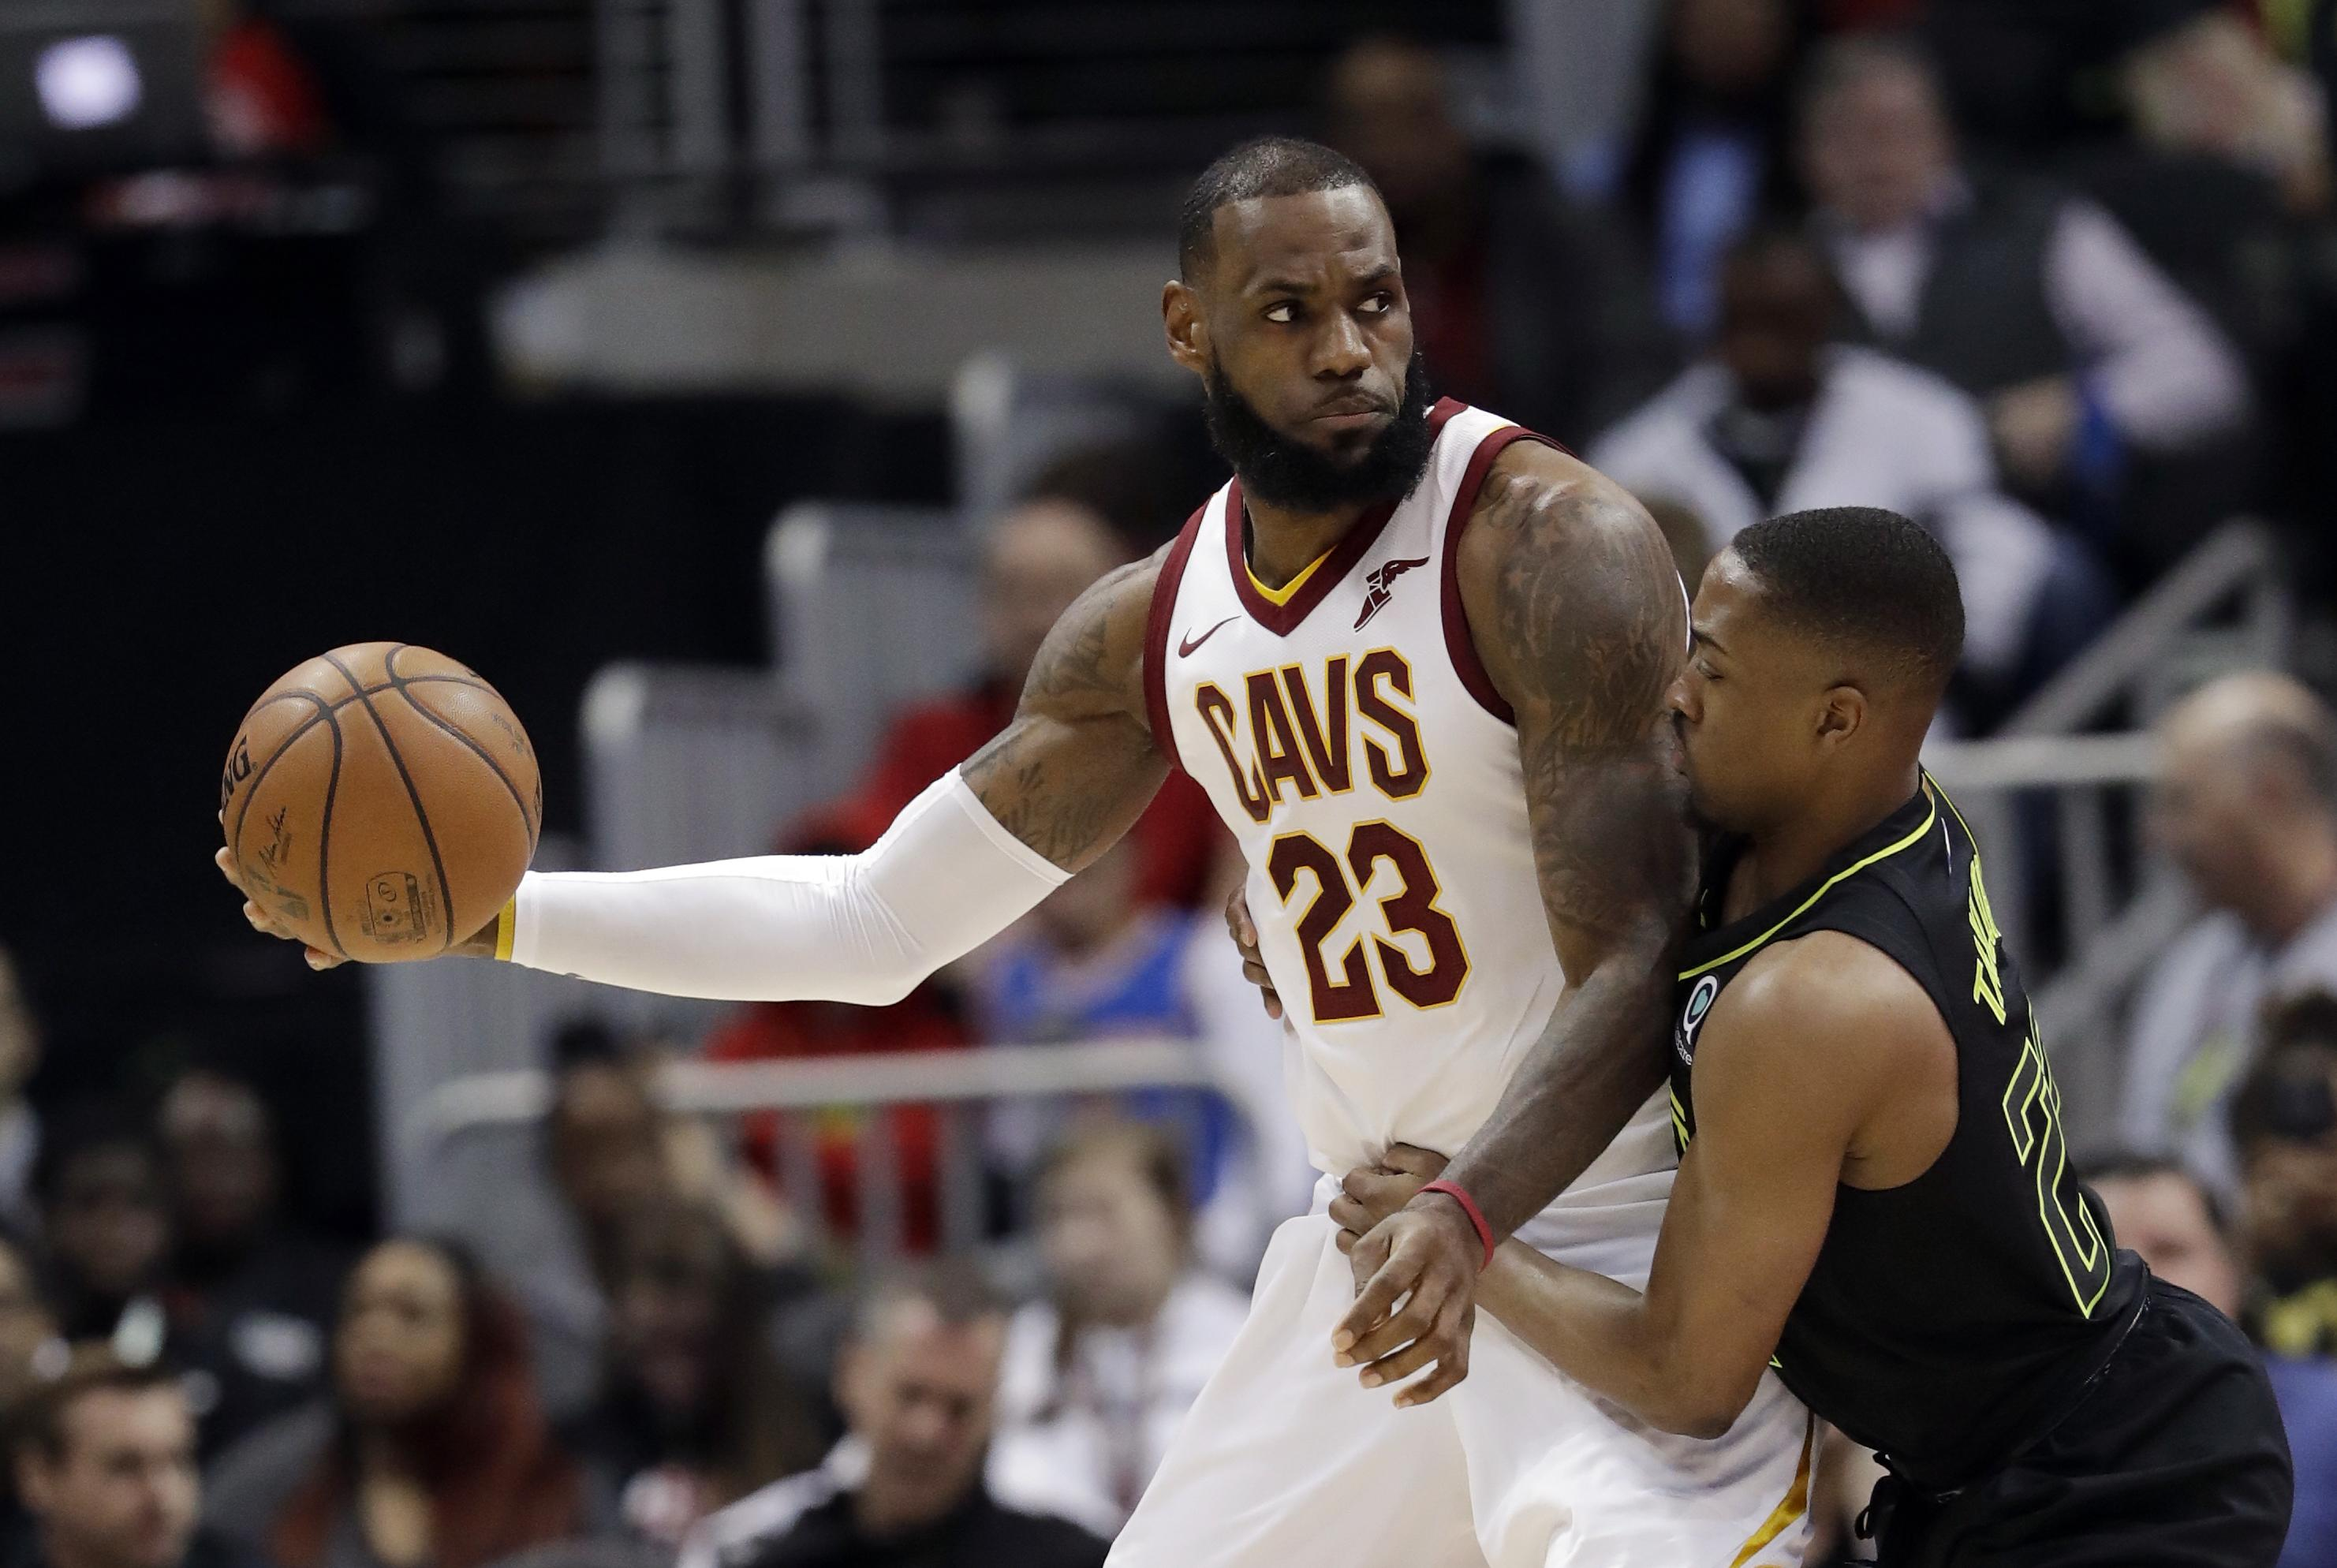 6e5dc46c2db Cleveland Cavaliers forward LeBron James (23) works against Atlanta Hawks  guard Isaiah Taylor (